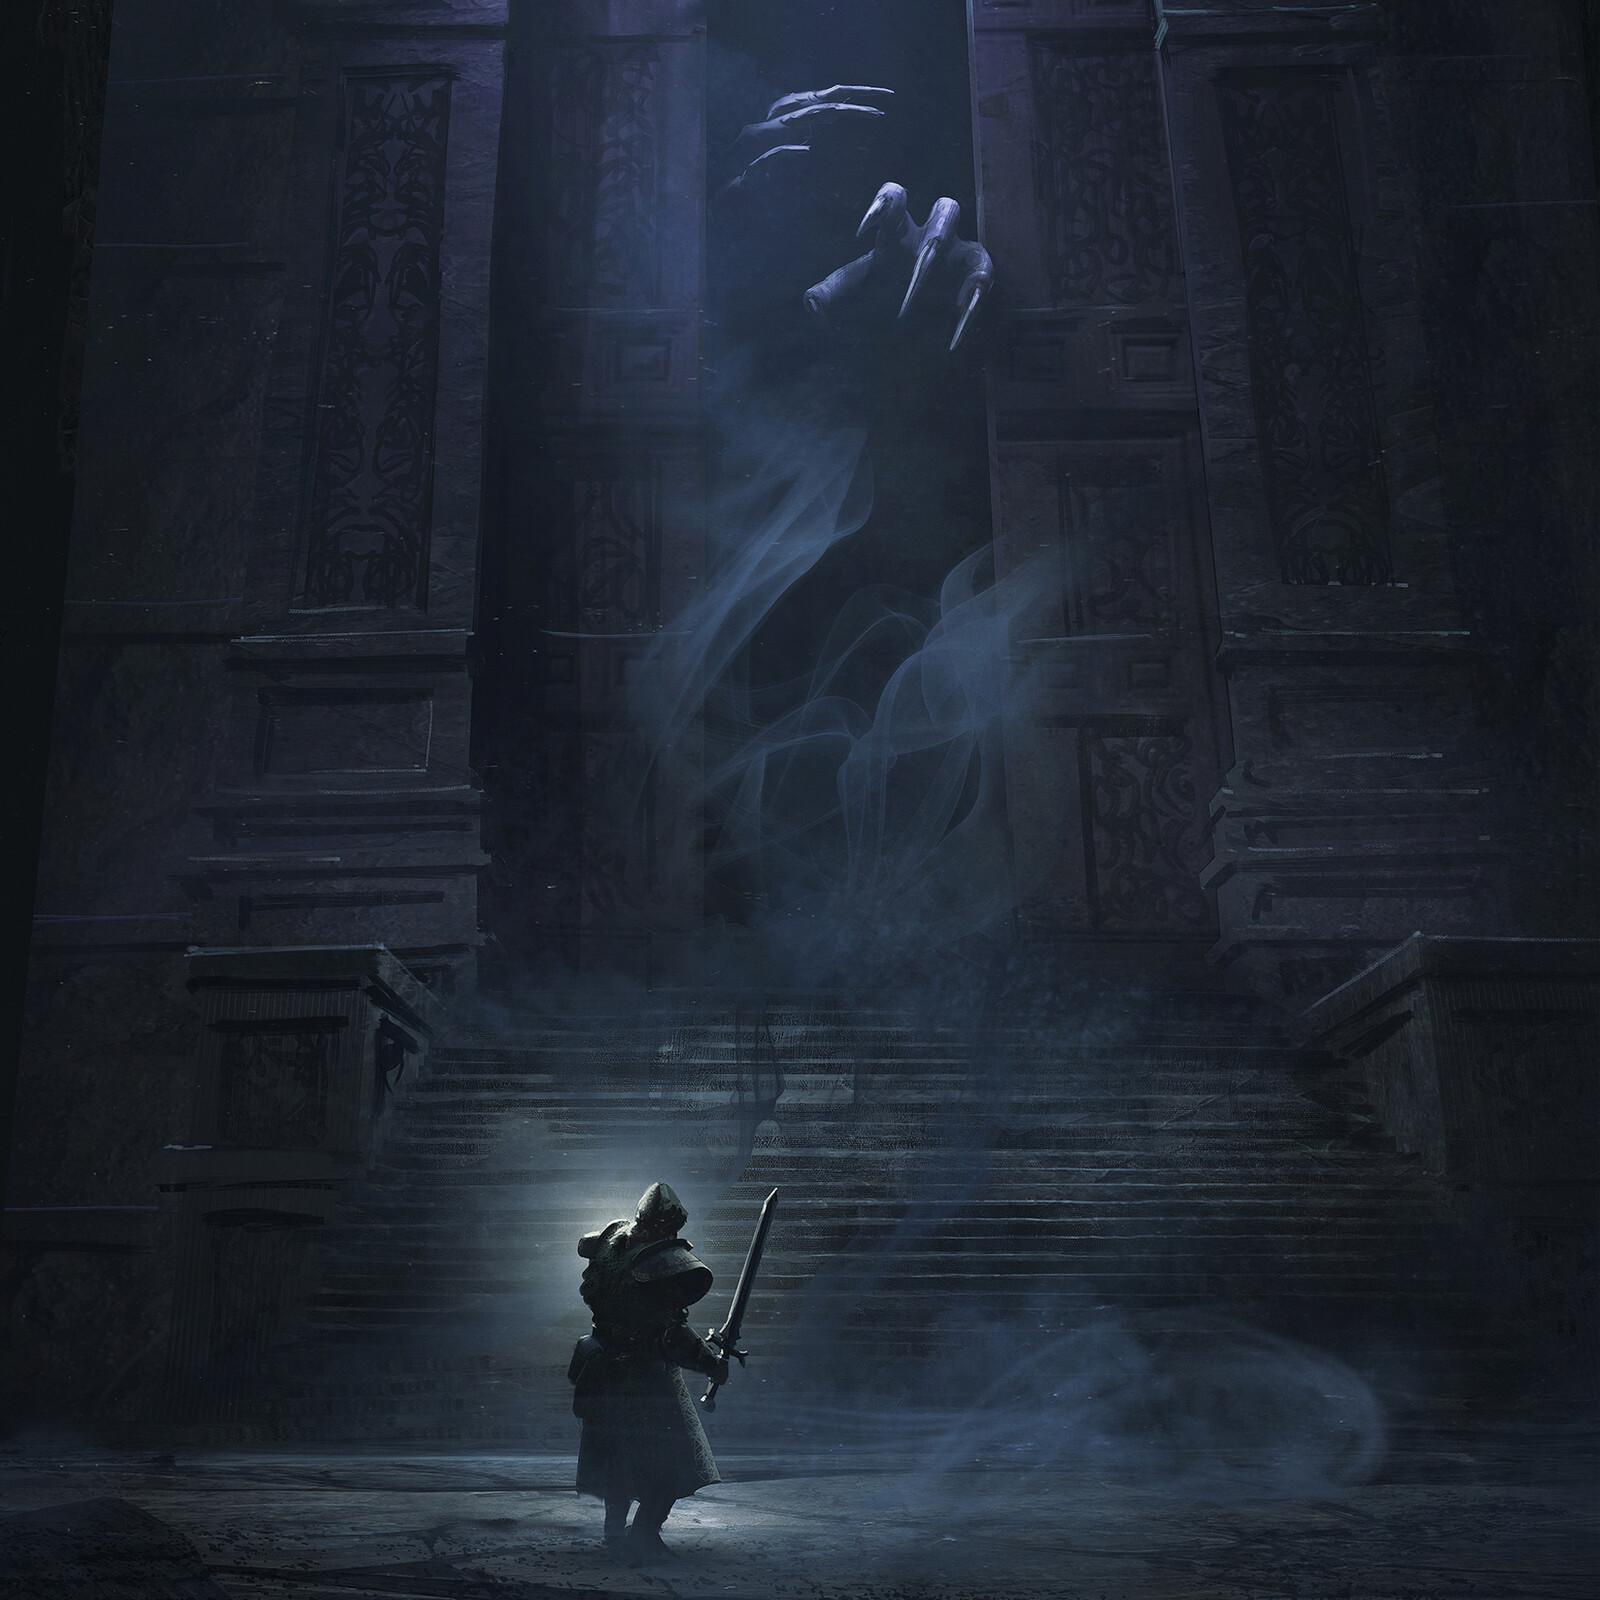 Approaching the Soul reaper